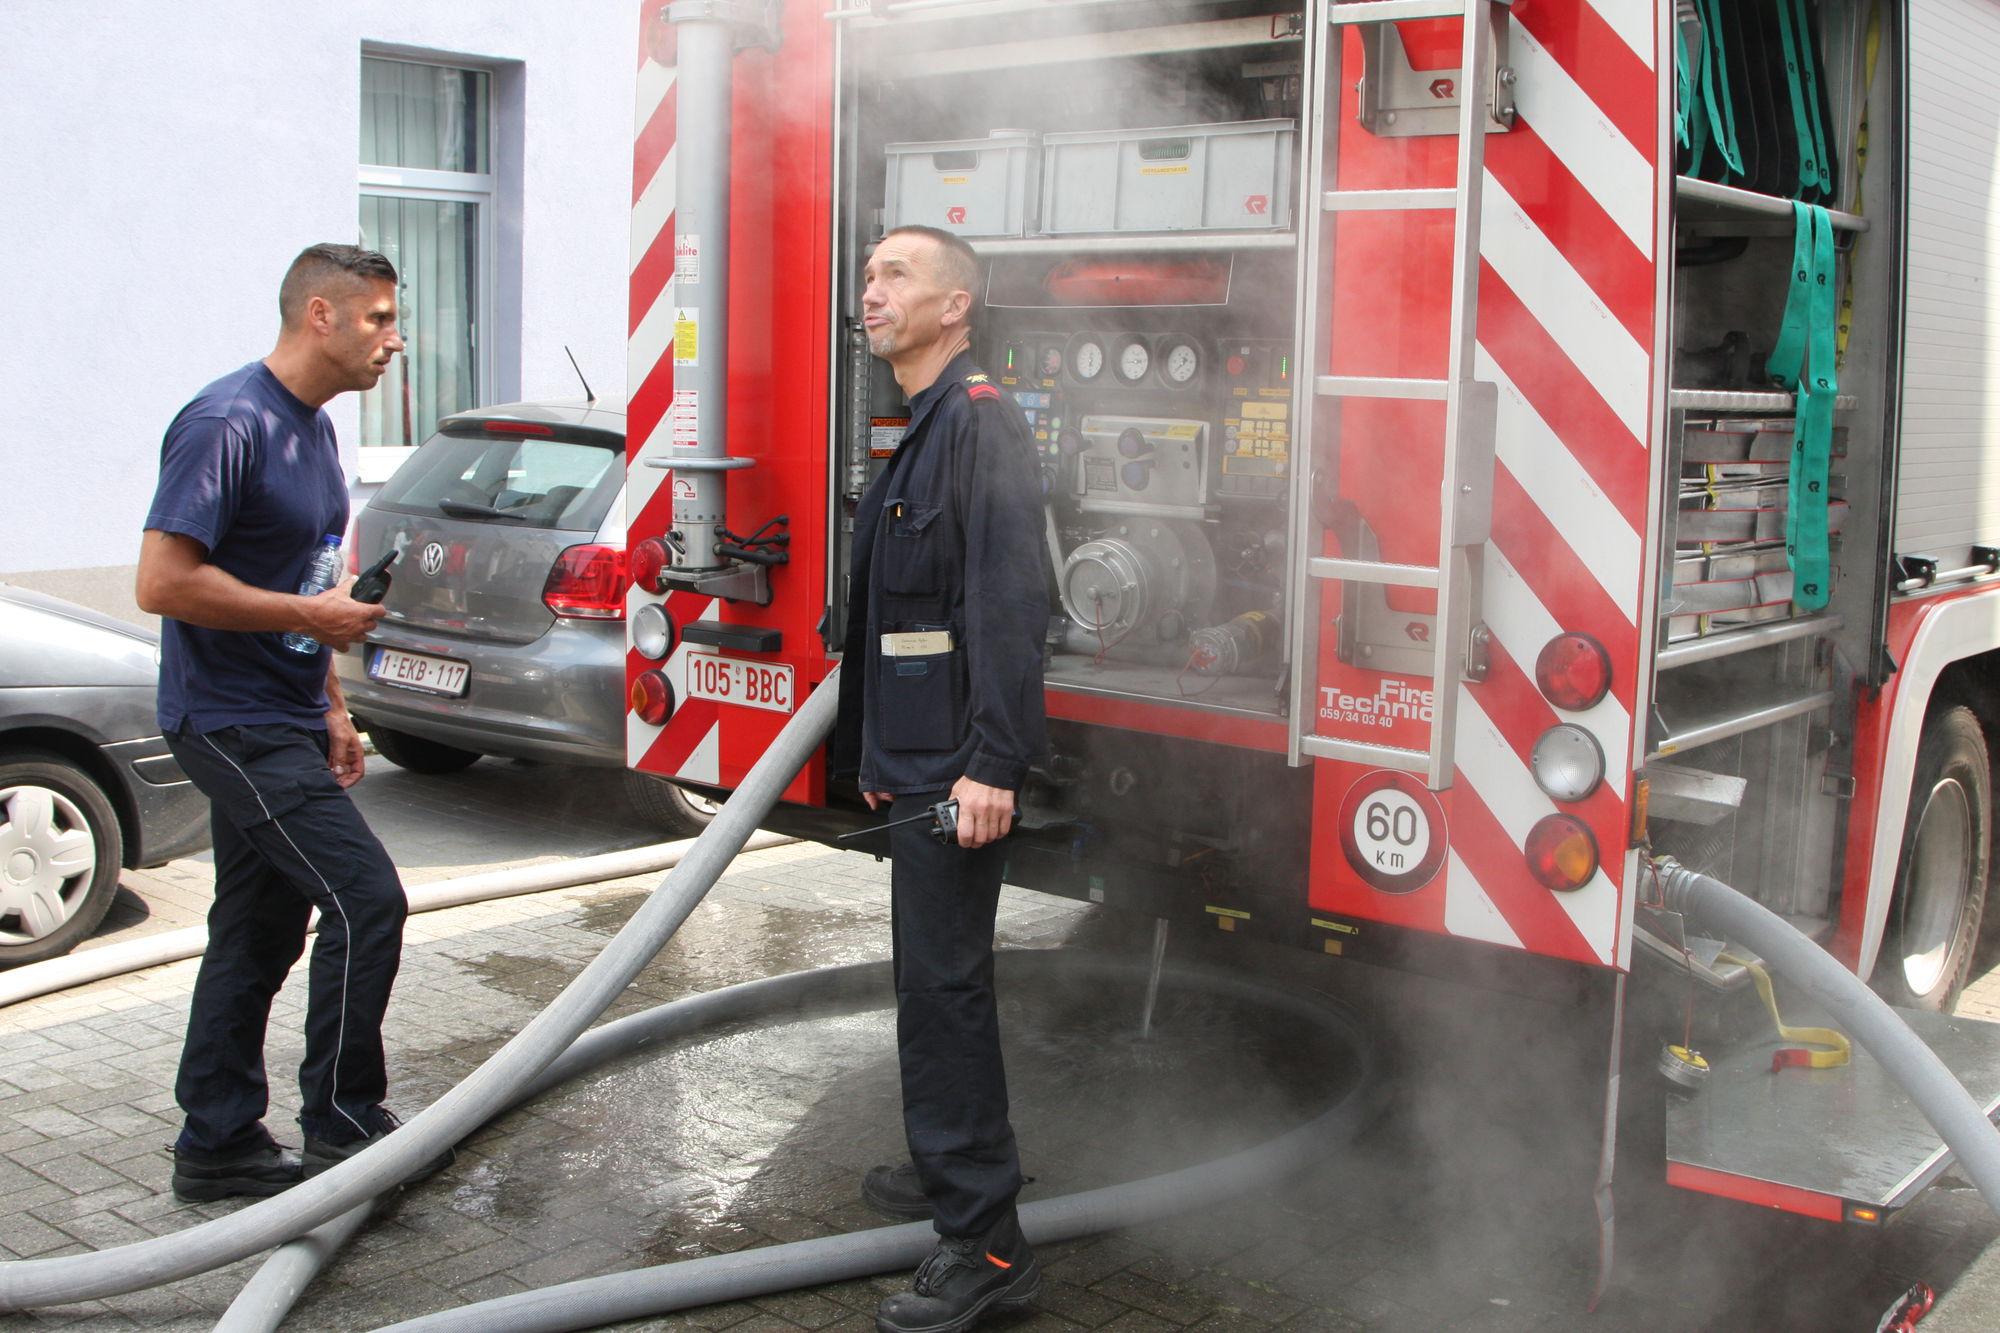 brand Hazelaarstraat pl 4